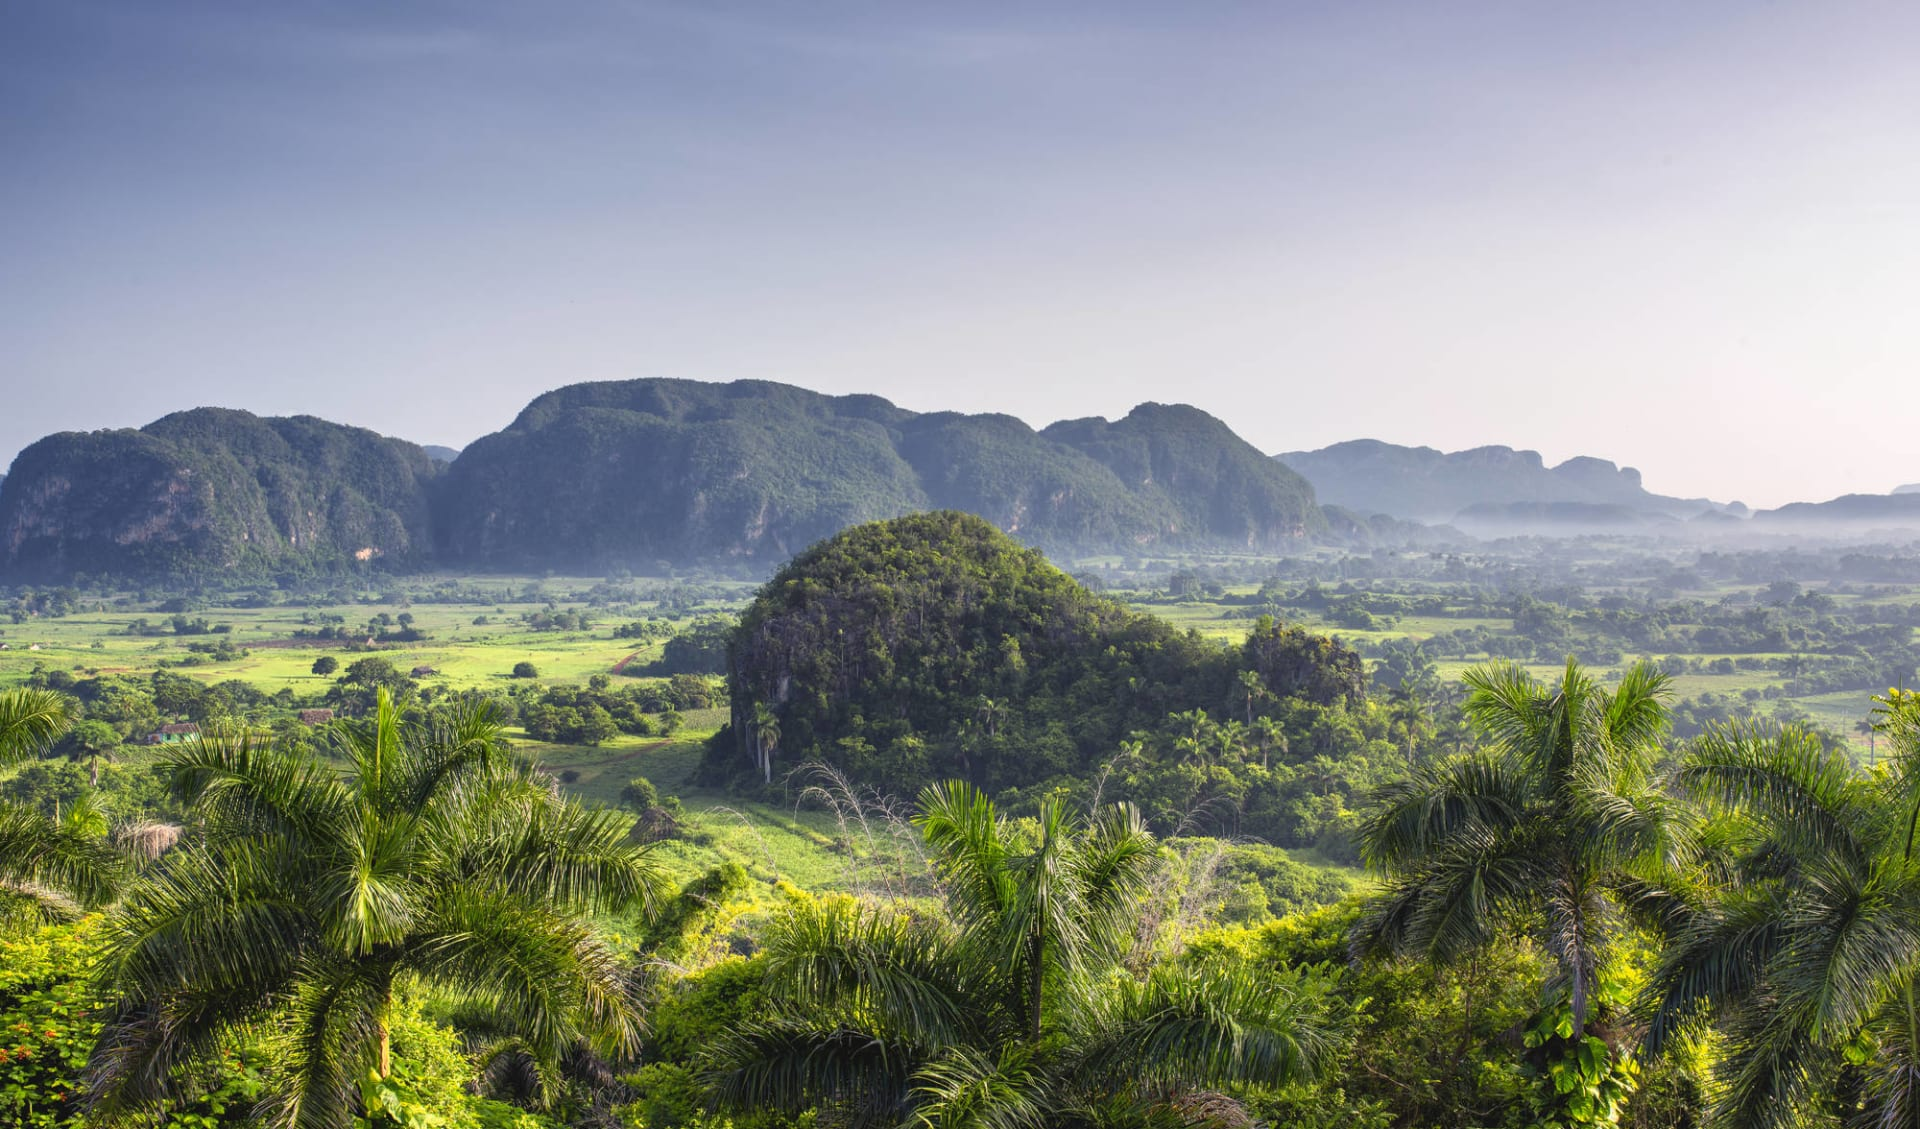 La Vida Cubana ab Havanna: Natur Ausflug Vinalestal - Vinalestal Landschaft - c